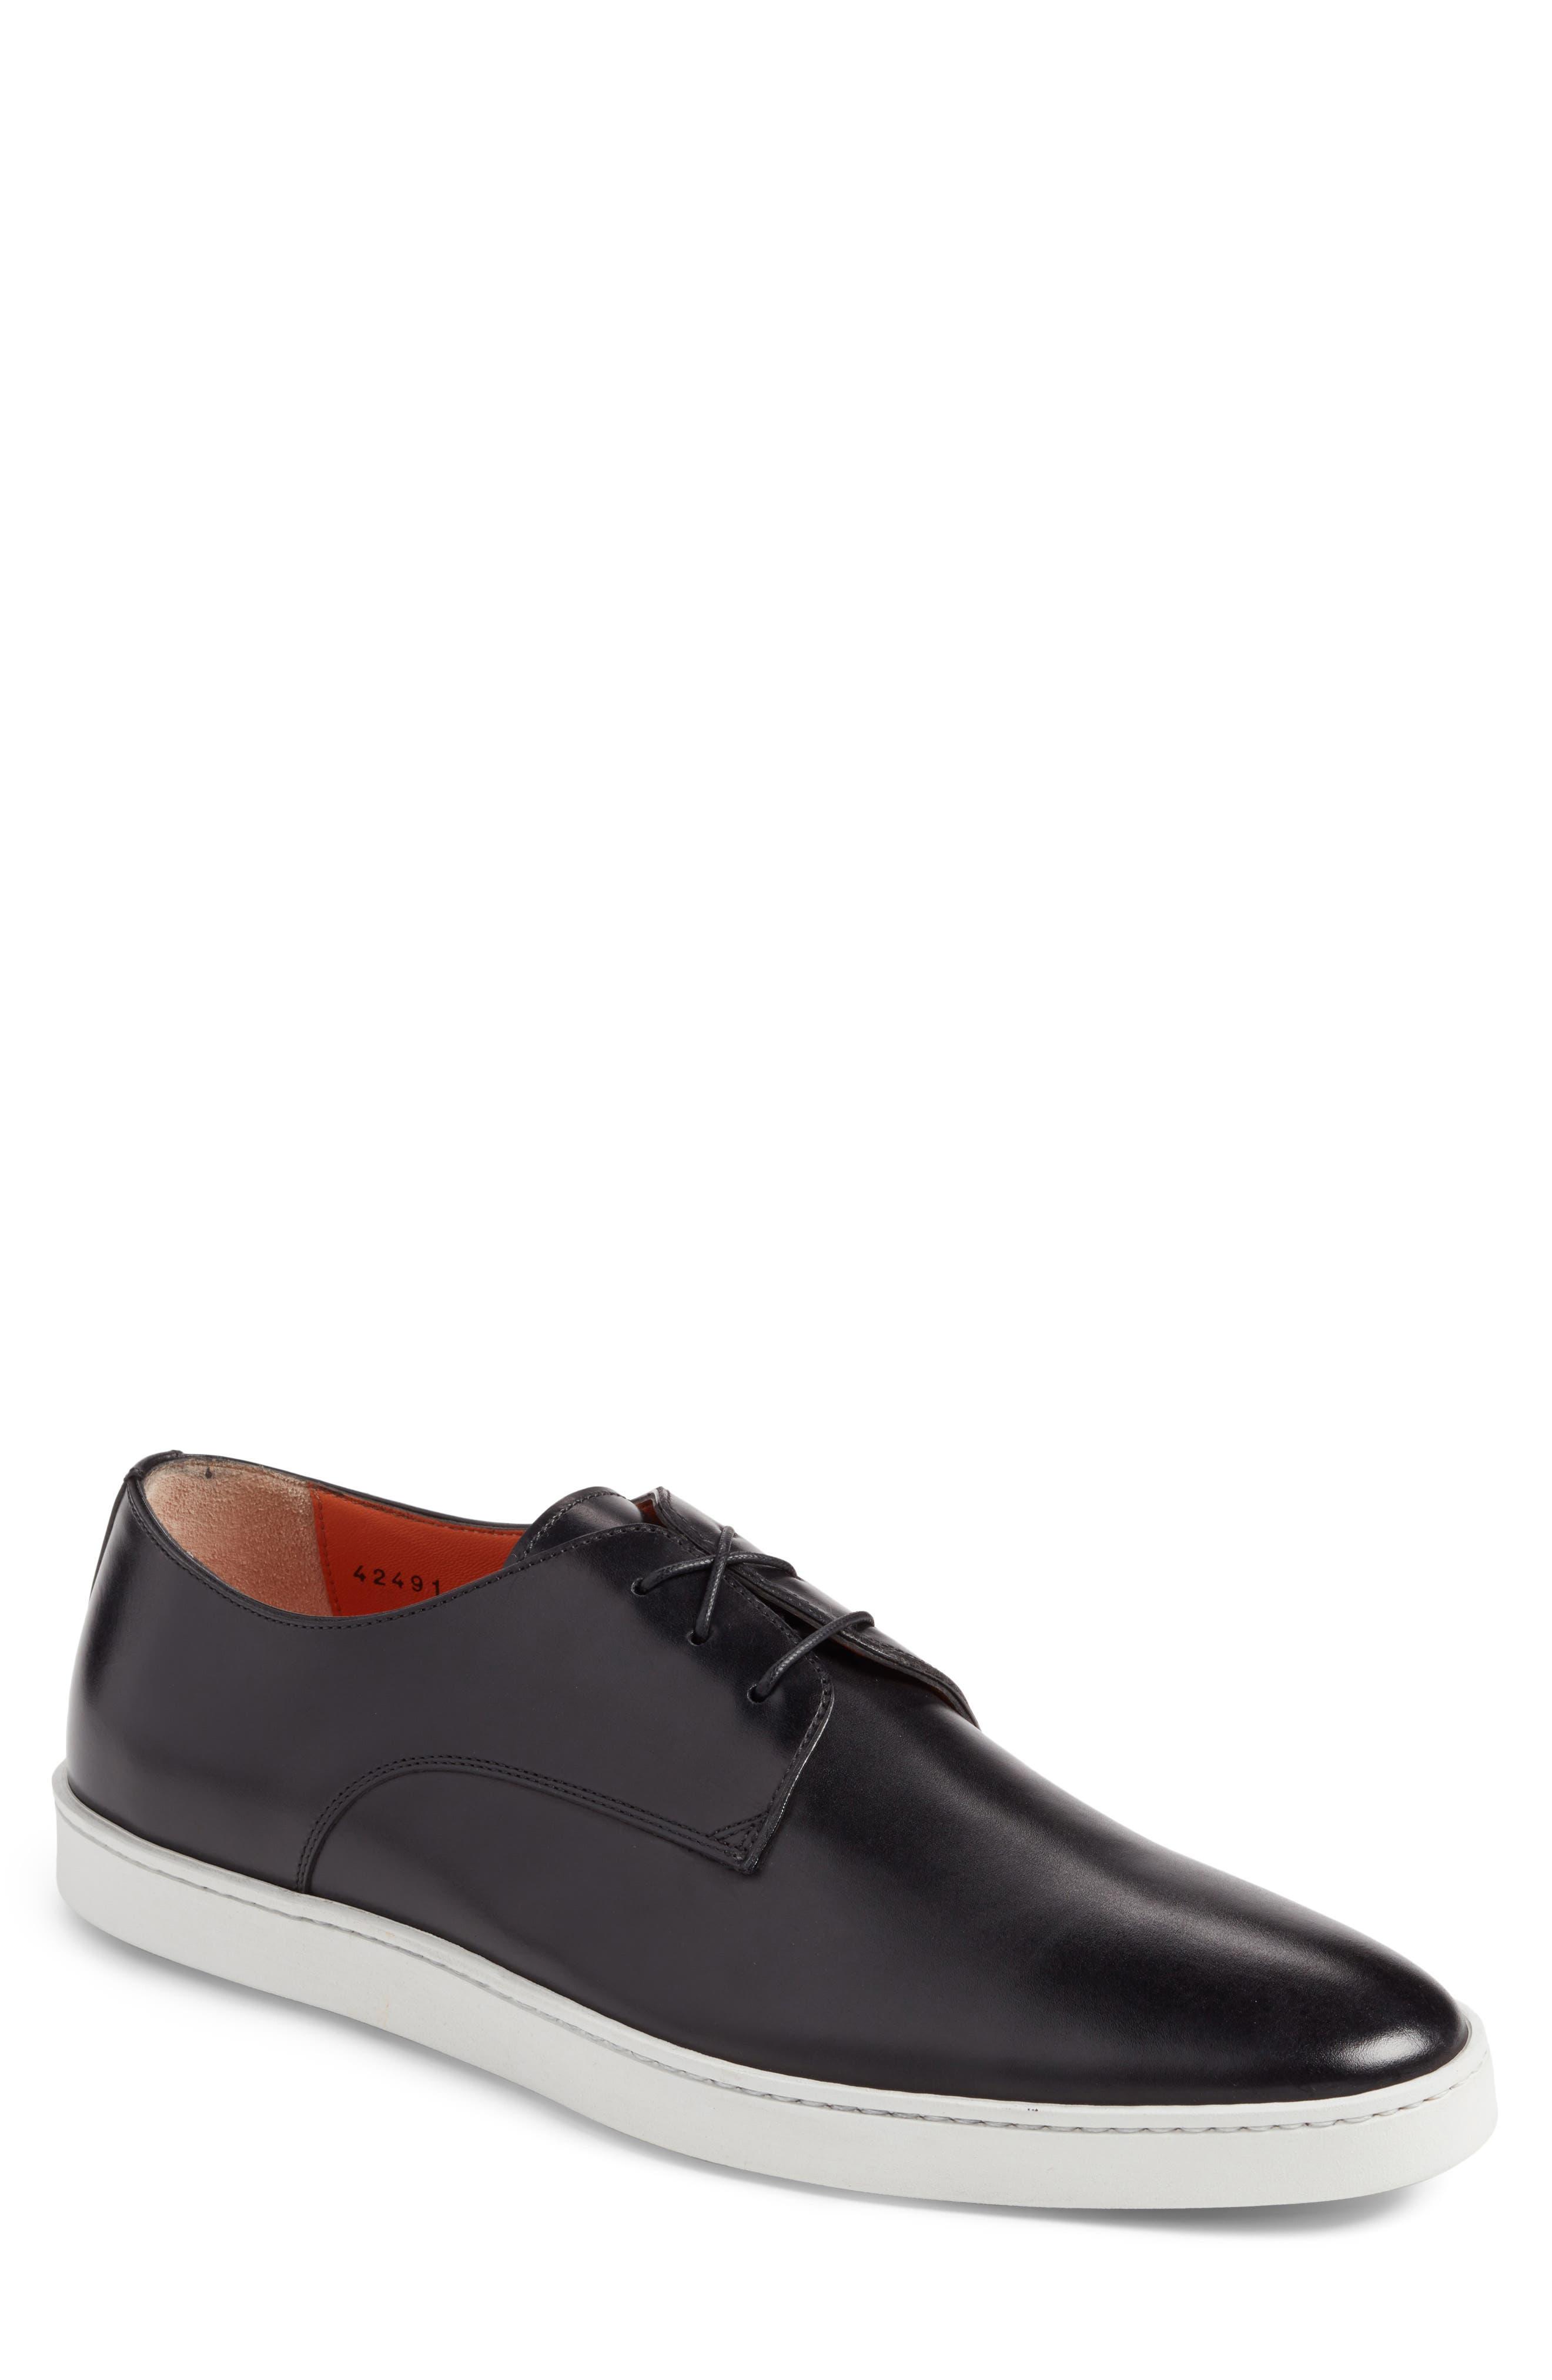 Doyle Sneaker,                         Main,                         color, BLACK LEATHER